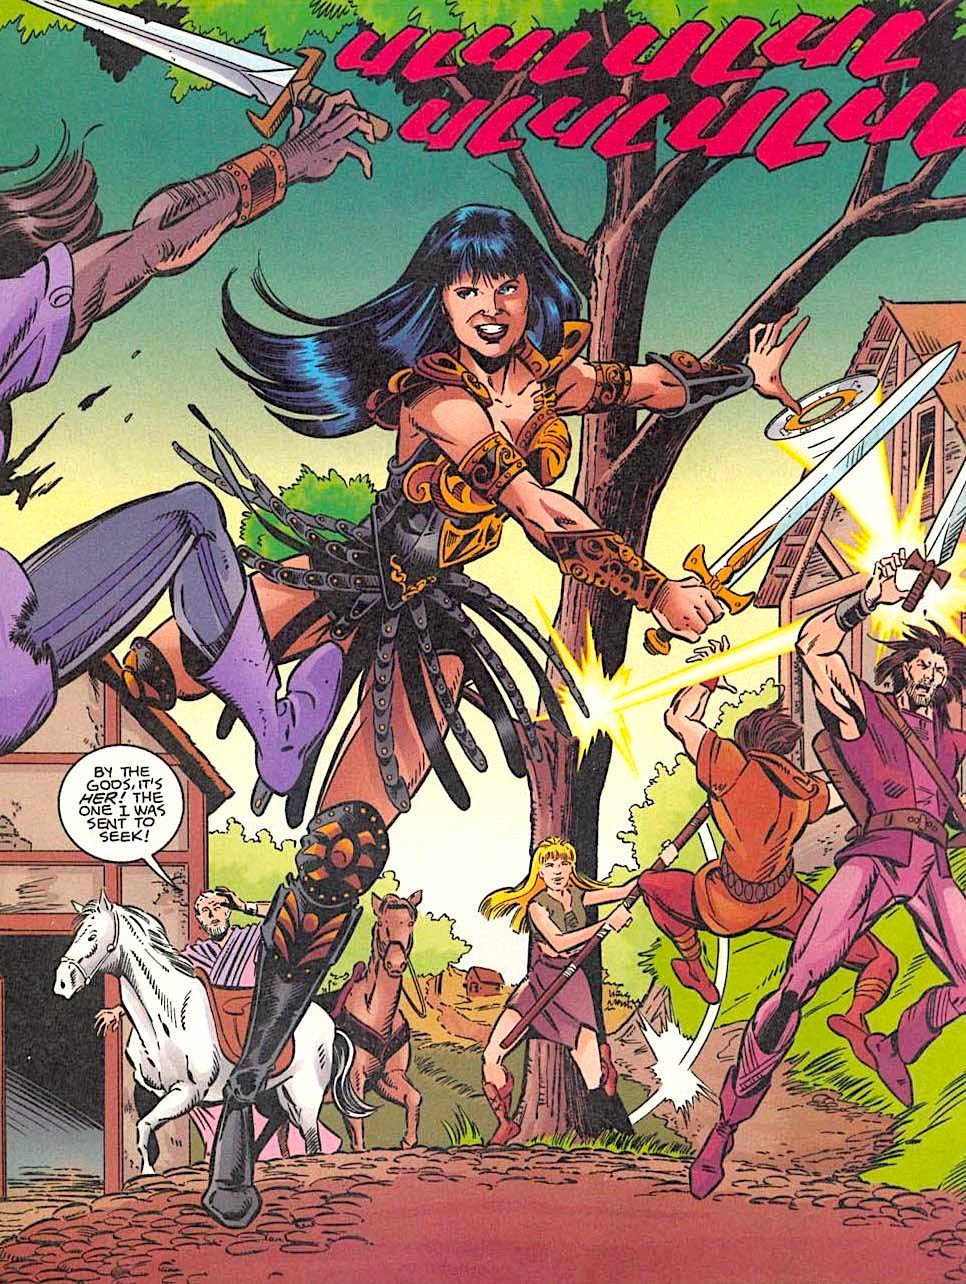 Xena vs Callisto Comic Book #1 Art Cover Topps Comics 1998 NEAR MINT